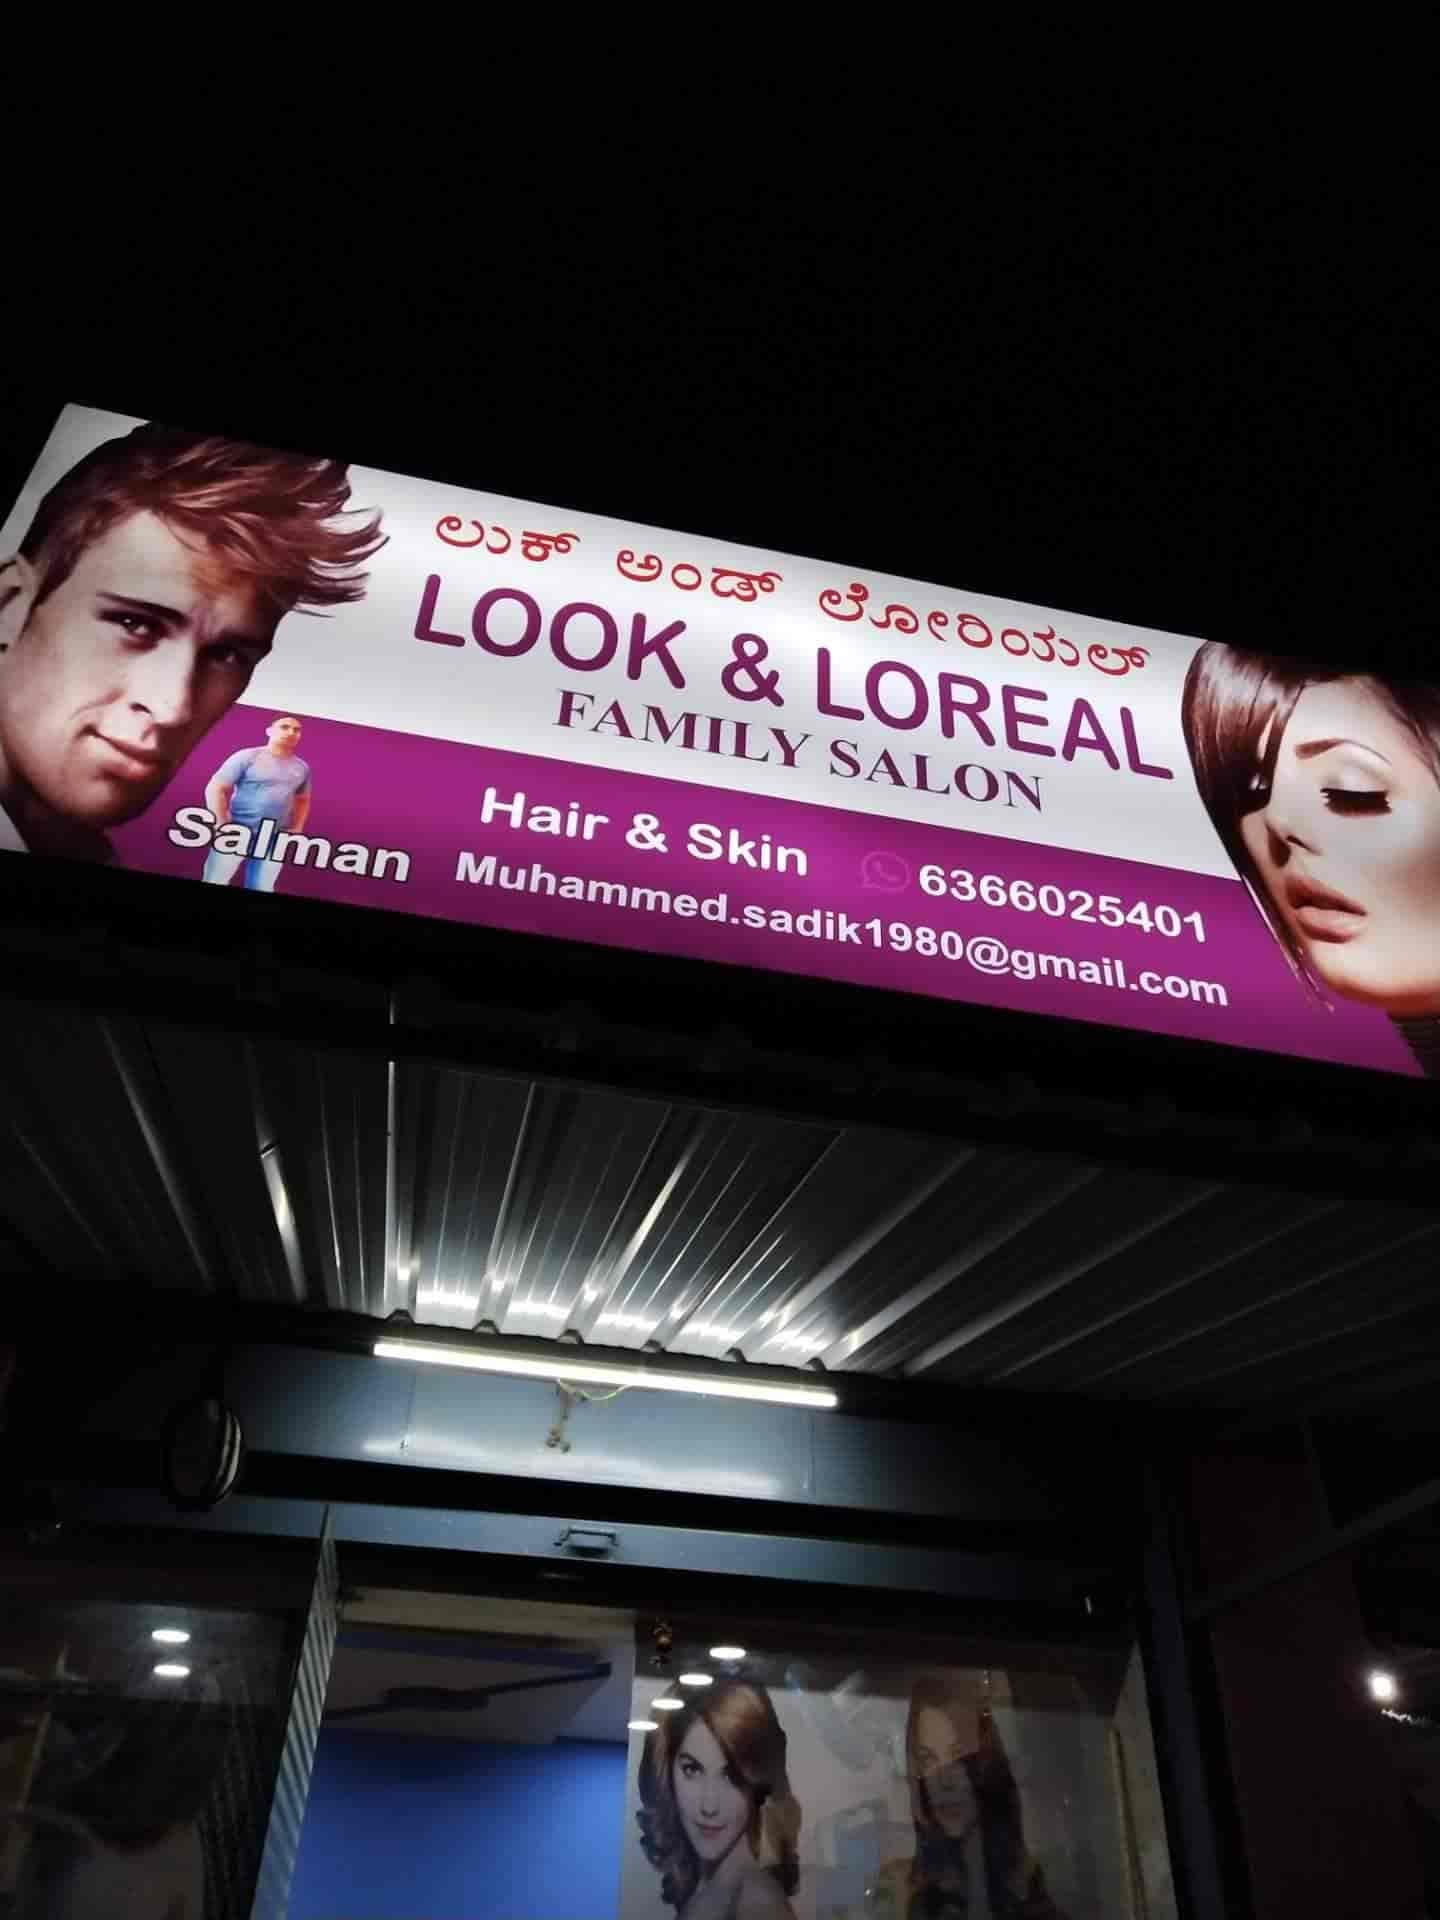 Look And Loreal, Mahadevapura - Beauty Spas in Bangalore - Justdial